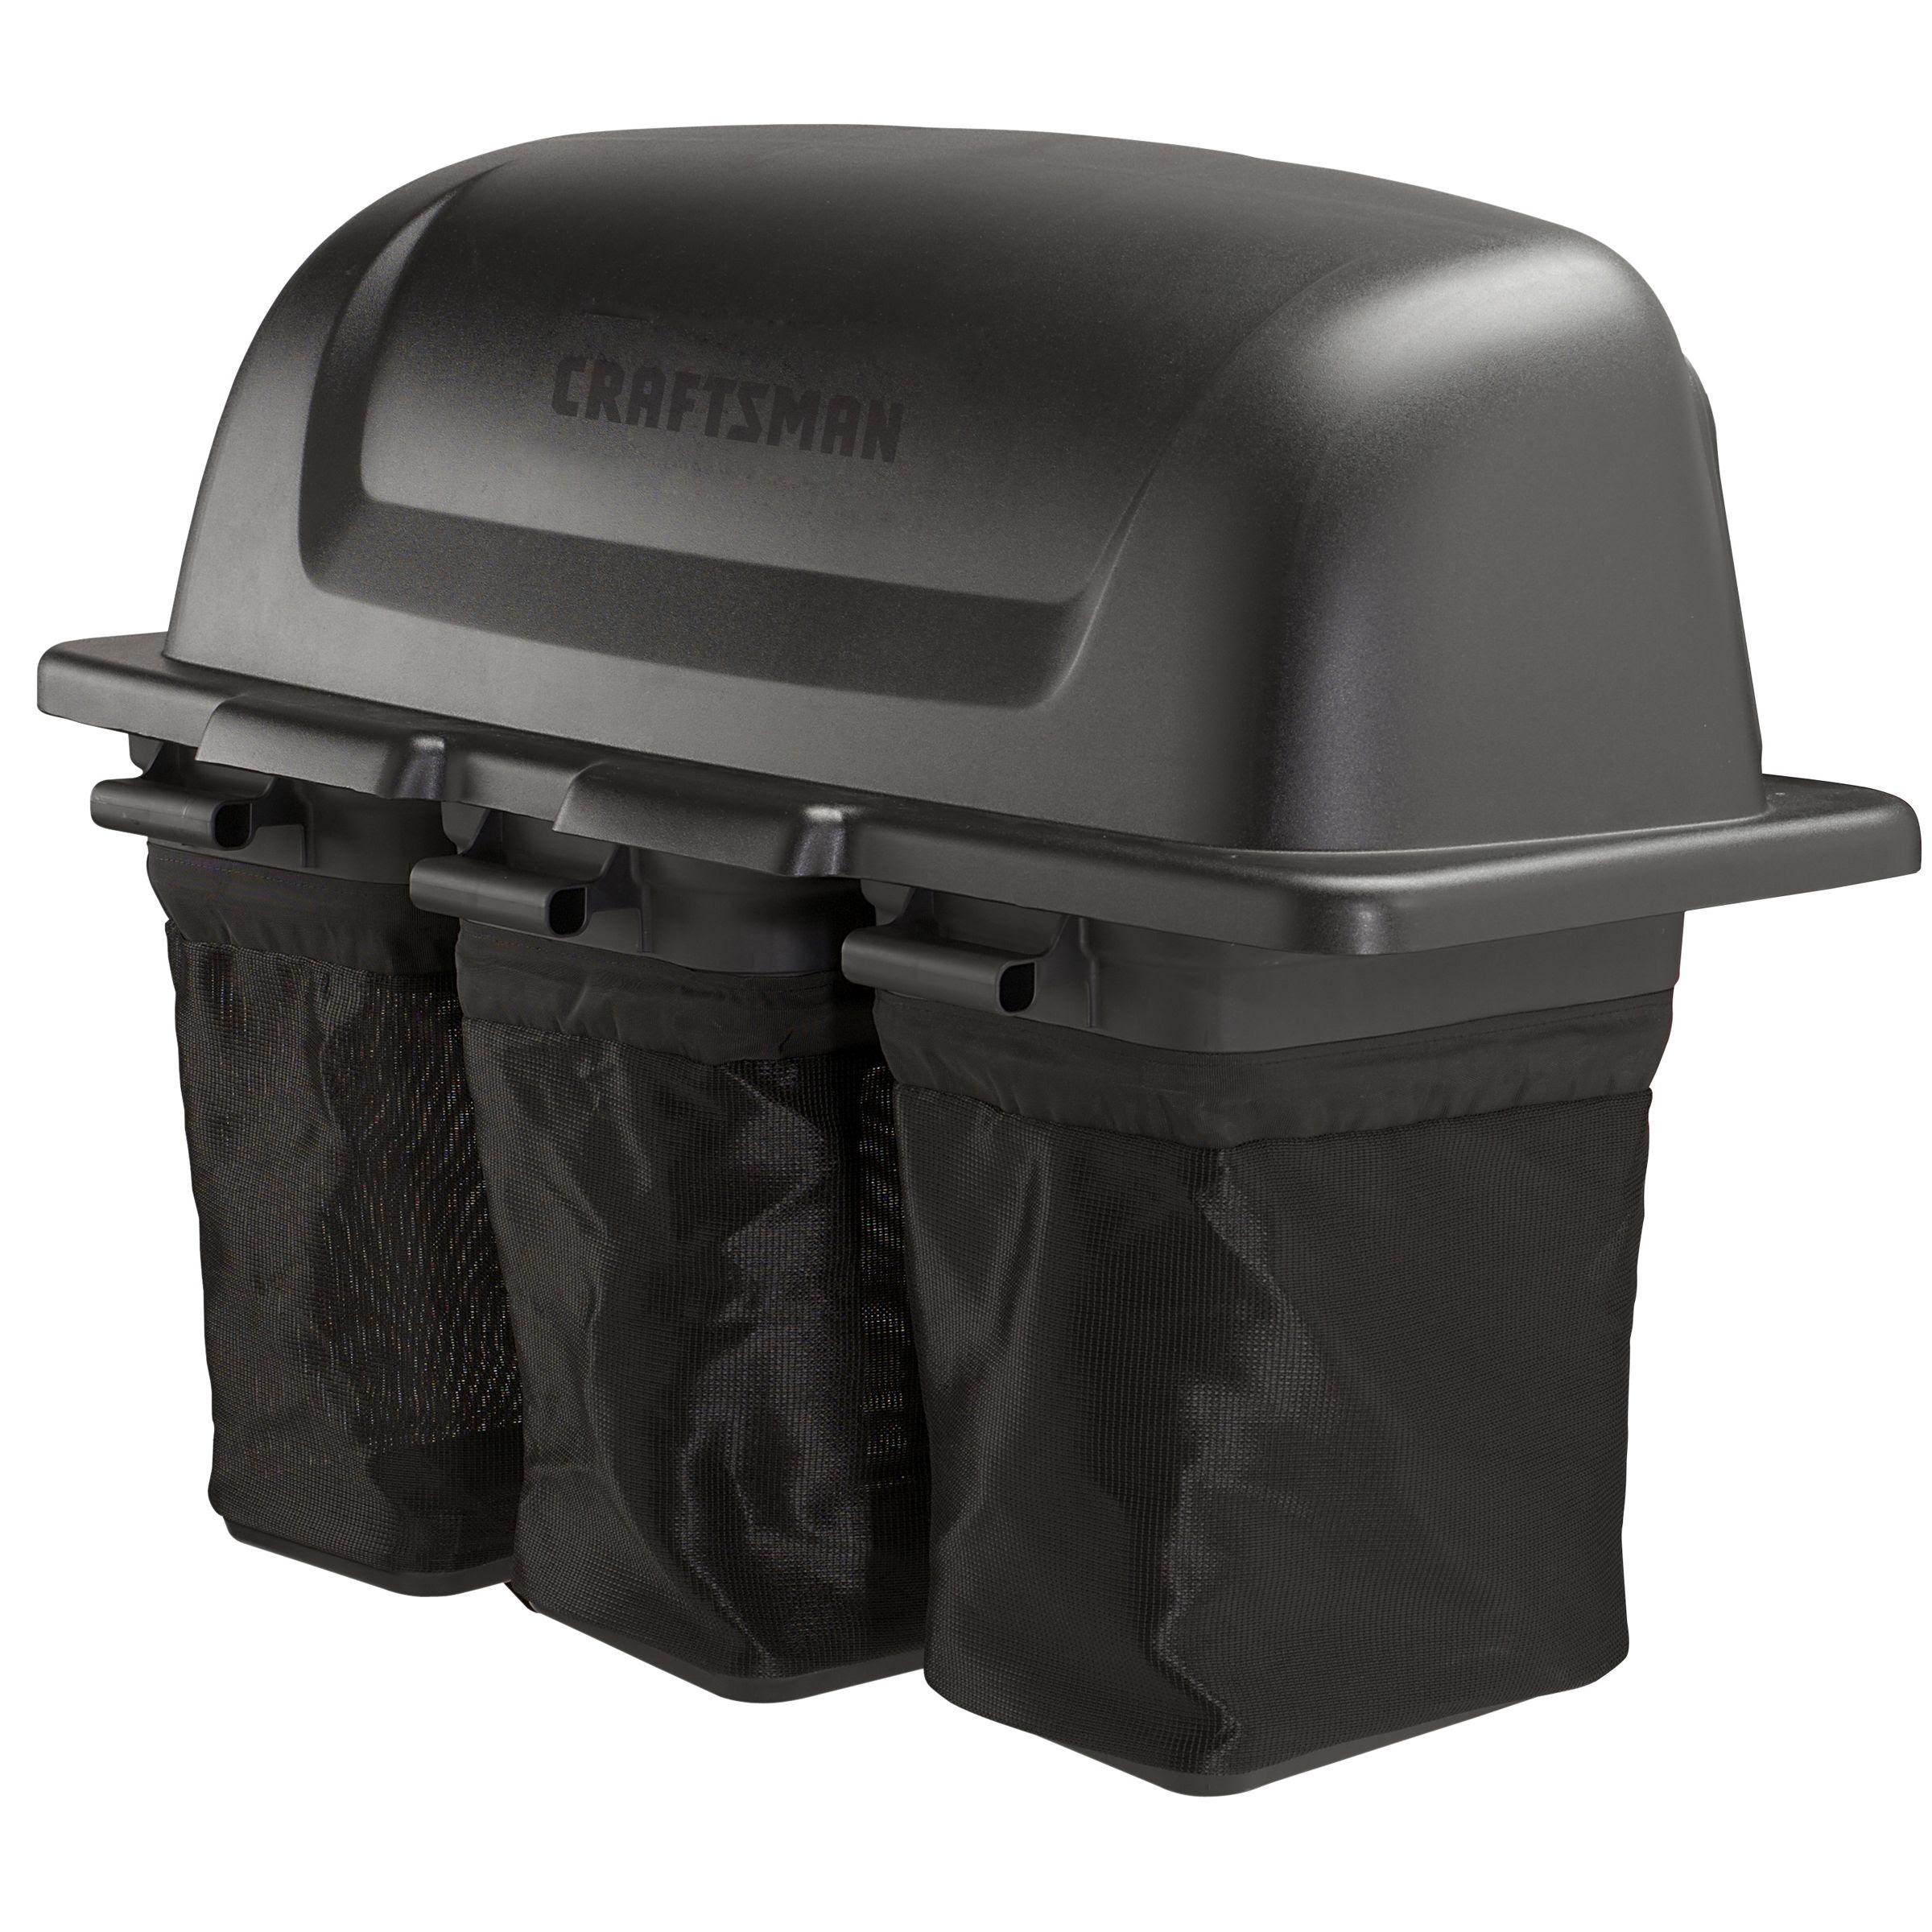 Craftsman 9 bushel 3 Bin Soft Bagger